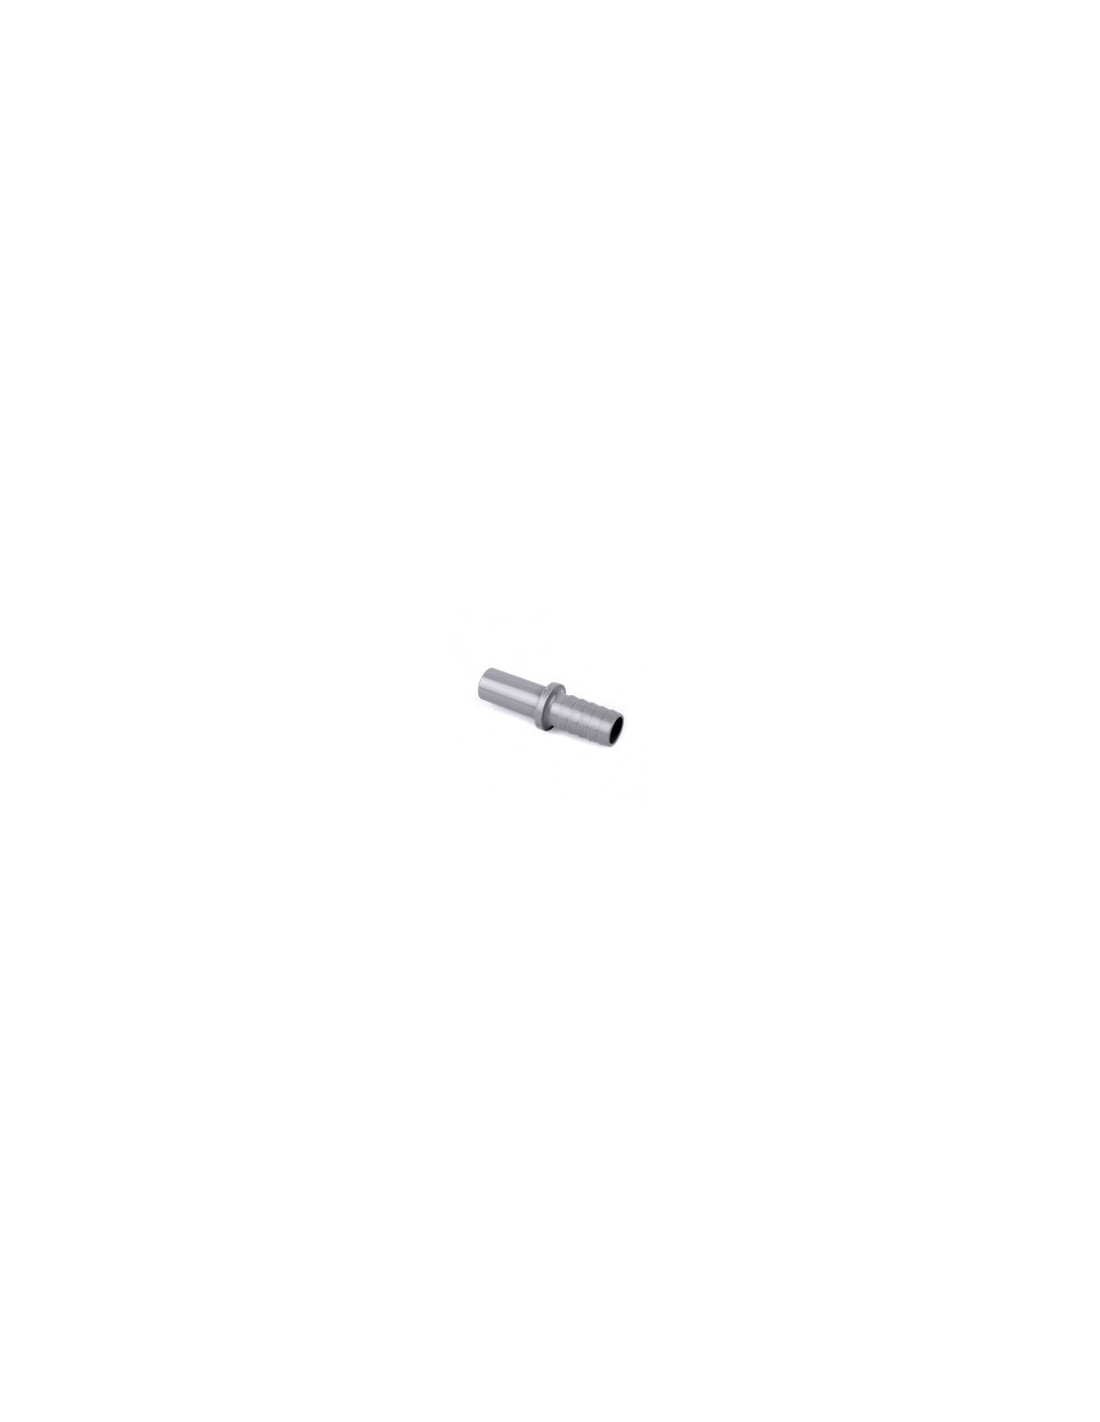 "SPO01952 - JG tube to hose stem 12.7 x 12.7 mm (1/2"")"